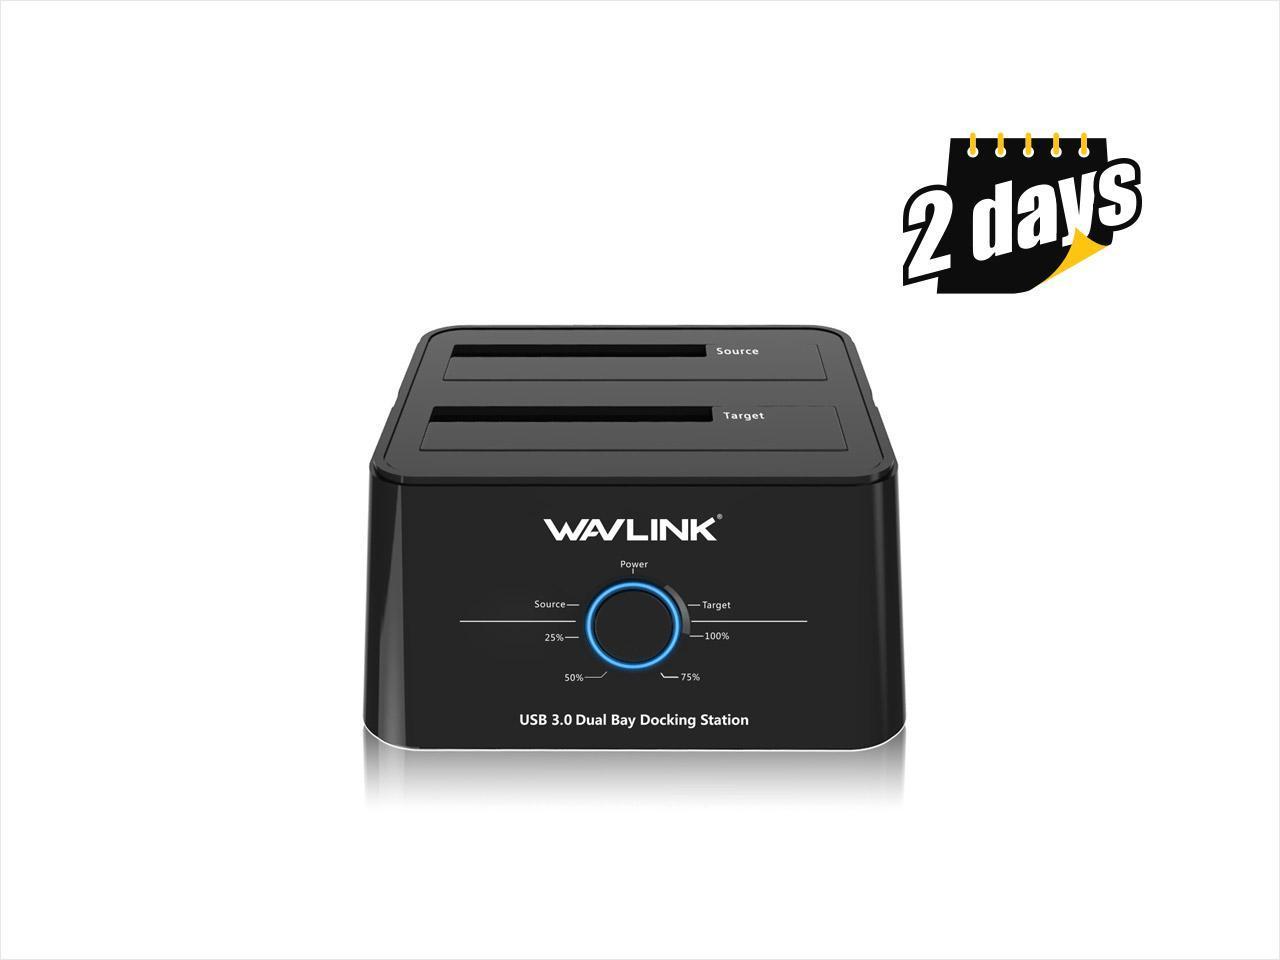 "Wavlink WL-ST334U B12TB Universal USB 3.0 Dual Bay Dock 2.5"" 3.5"" SATA HDD/SSD Storage Docking Station Hard Drive Enclosure, 5Gbps Transmission Rates Offline Clone and One Button Backup - Black"